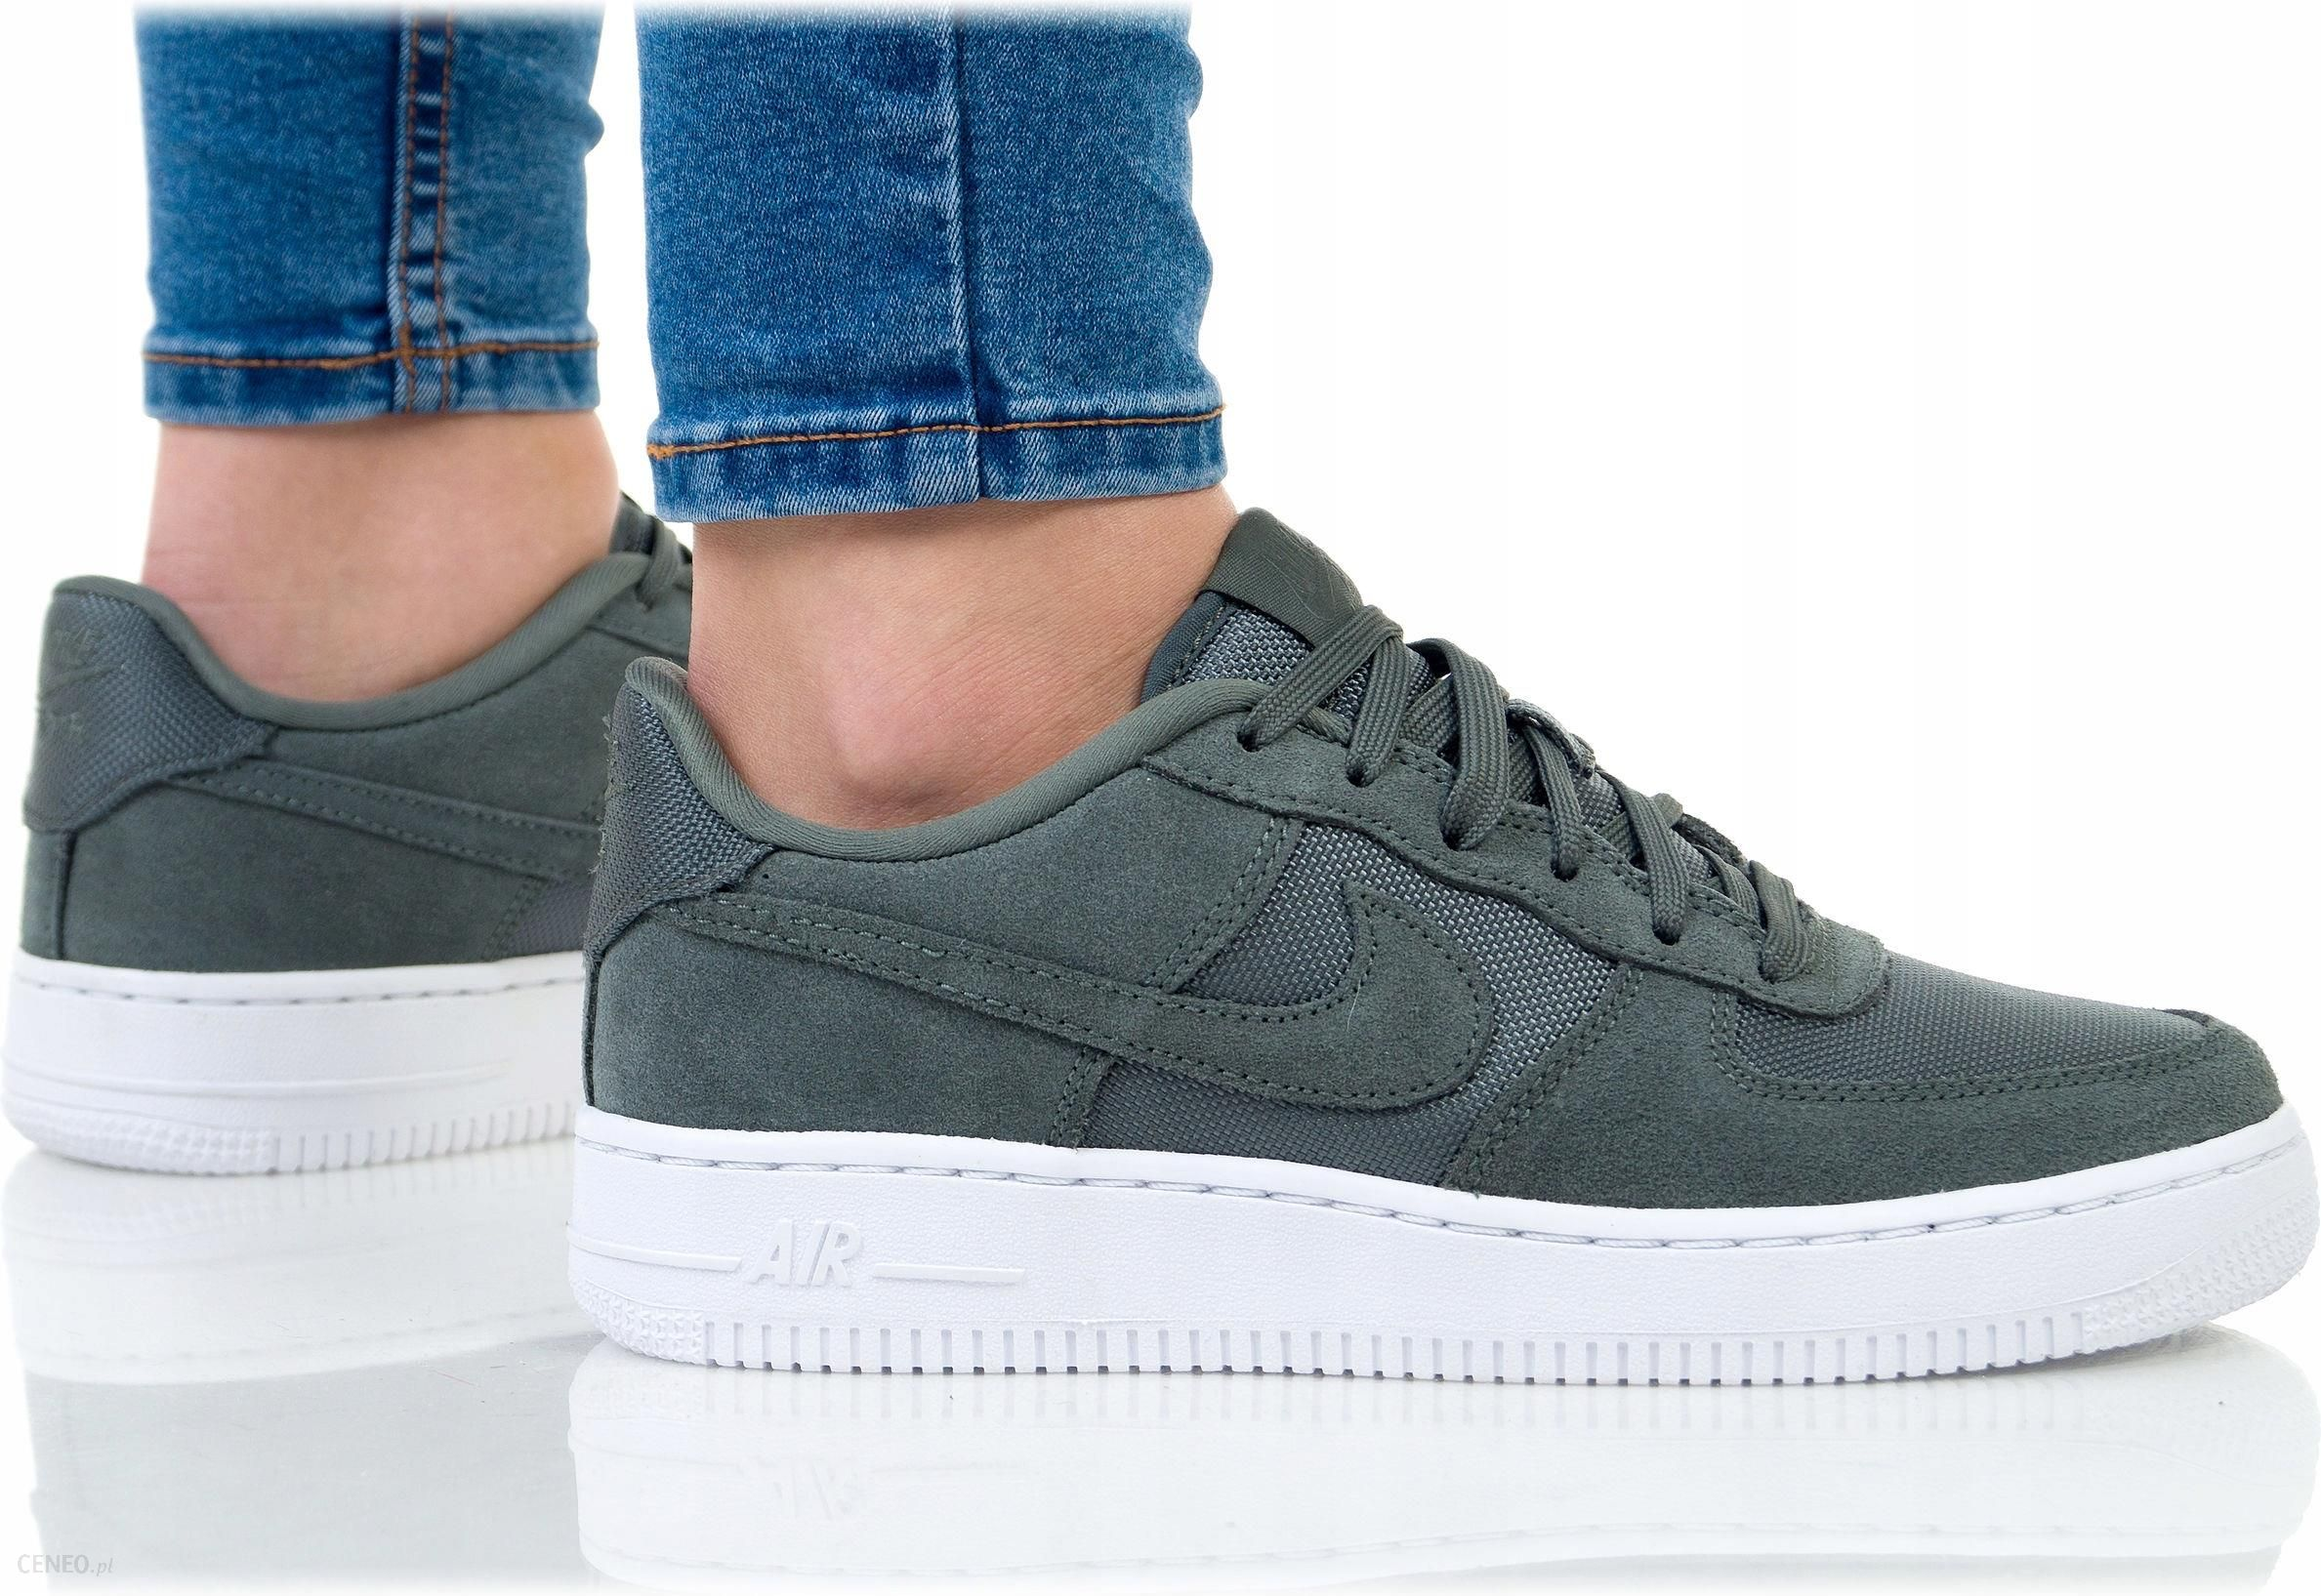 Buty Nike Damskie Air Force 1 1 BQ6979 300 R. 39 Ceny i